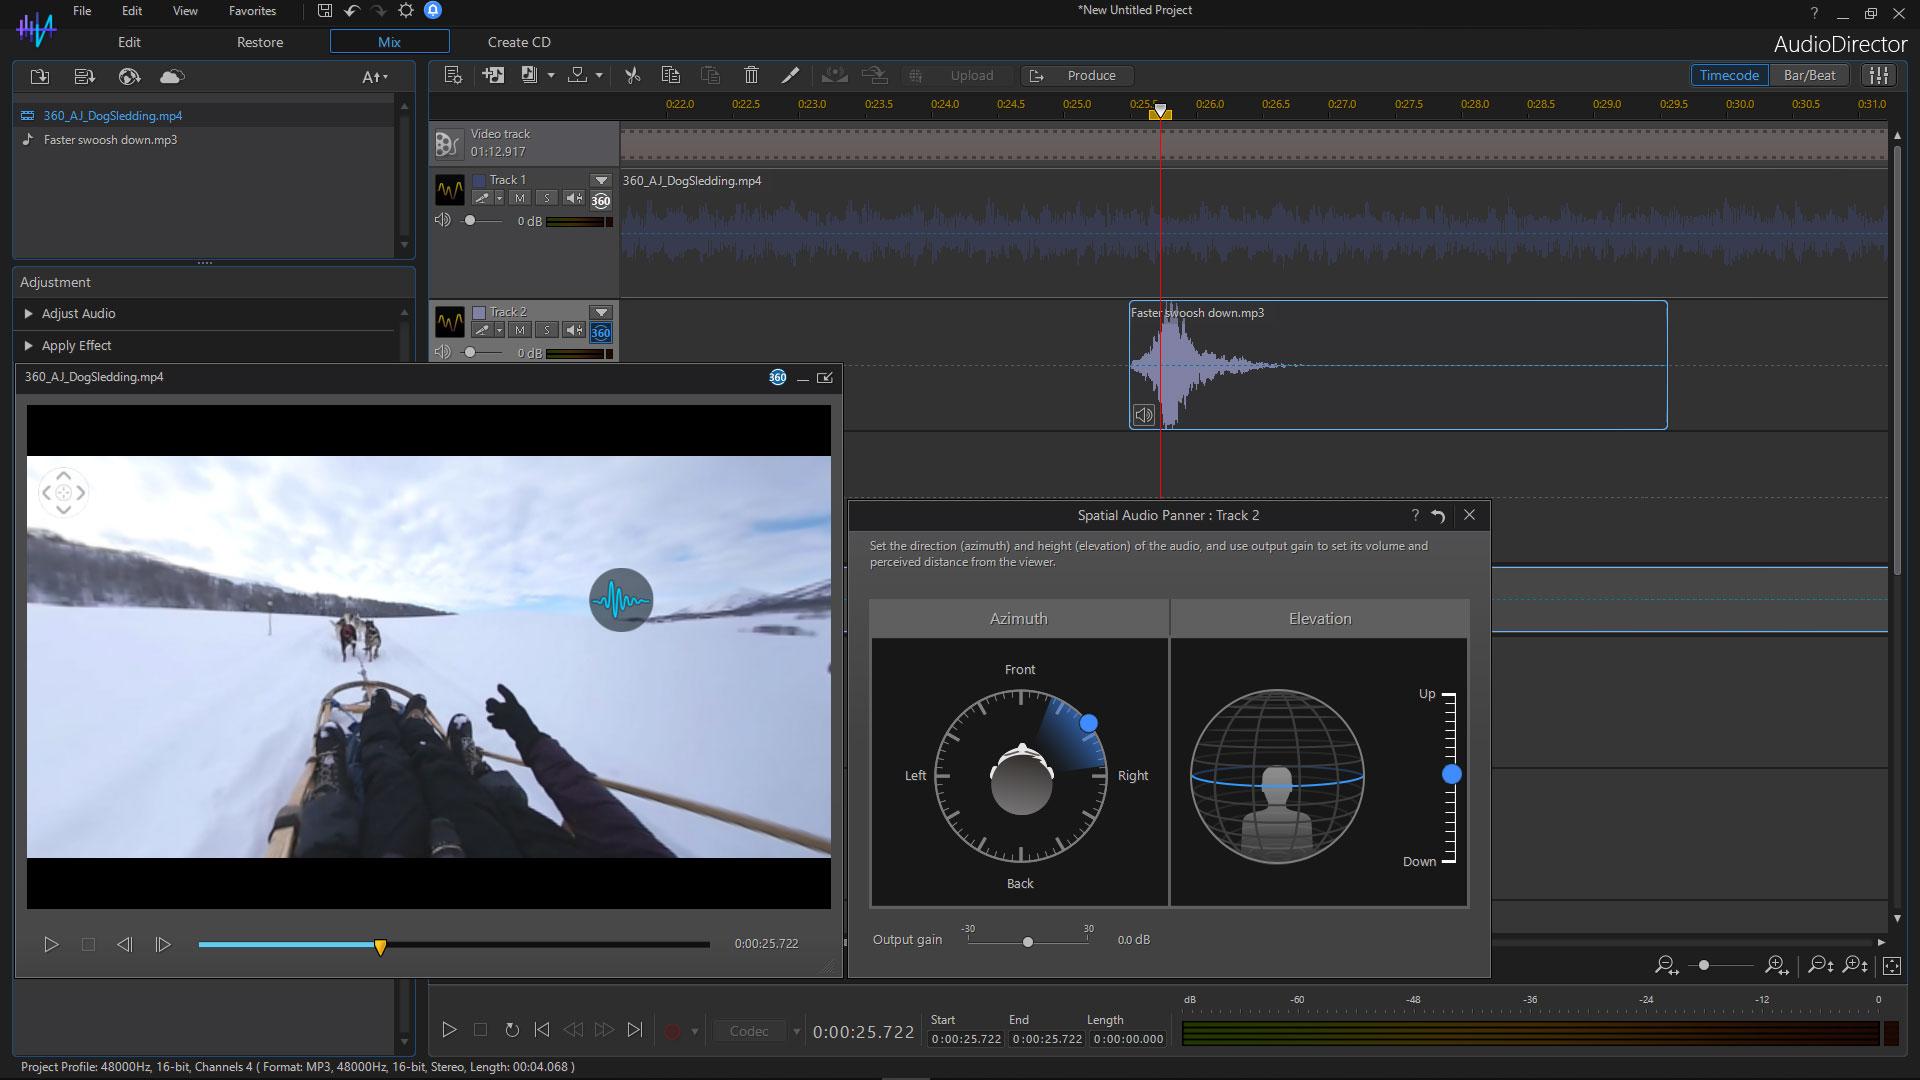 CyberLink: PowerDirector 18 and PhotoDirector 11 released 5